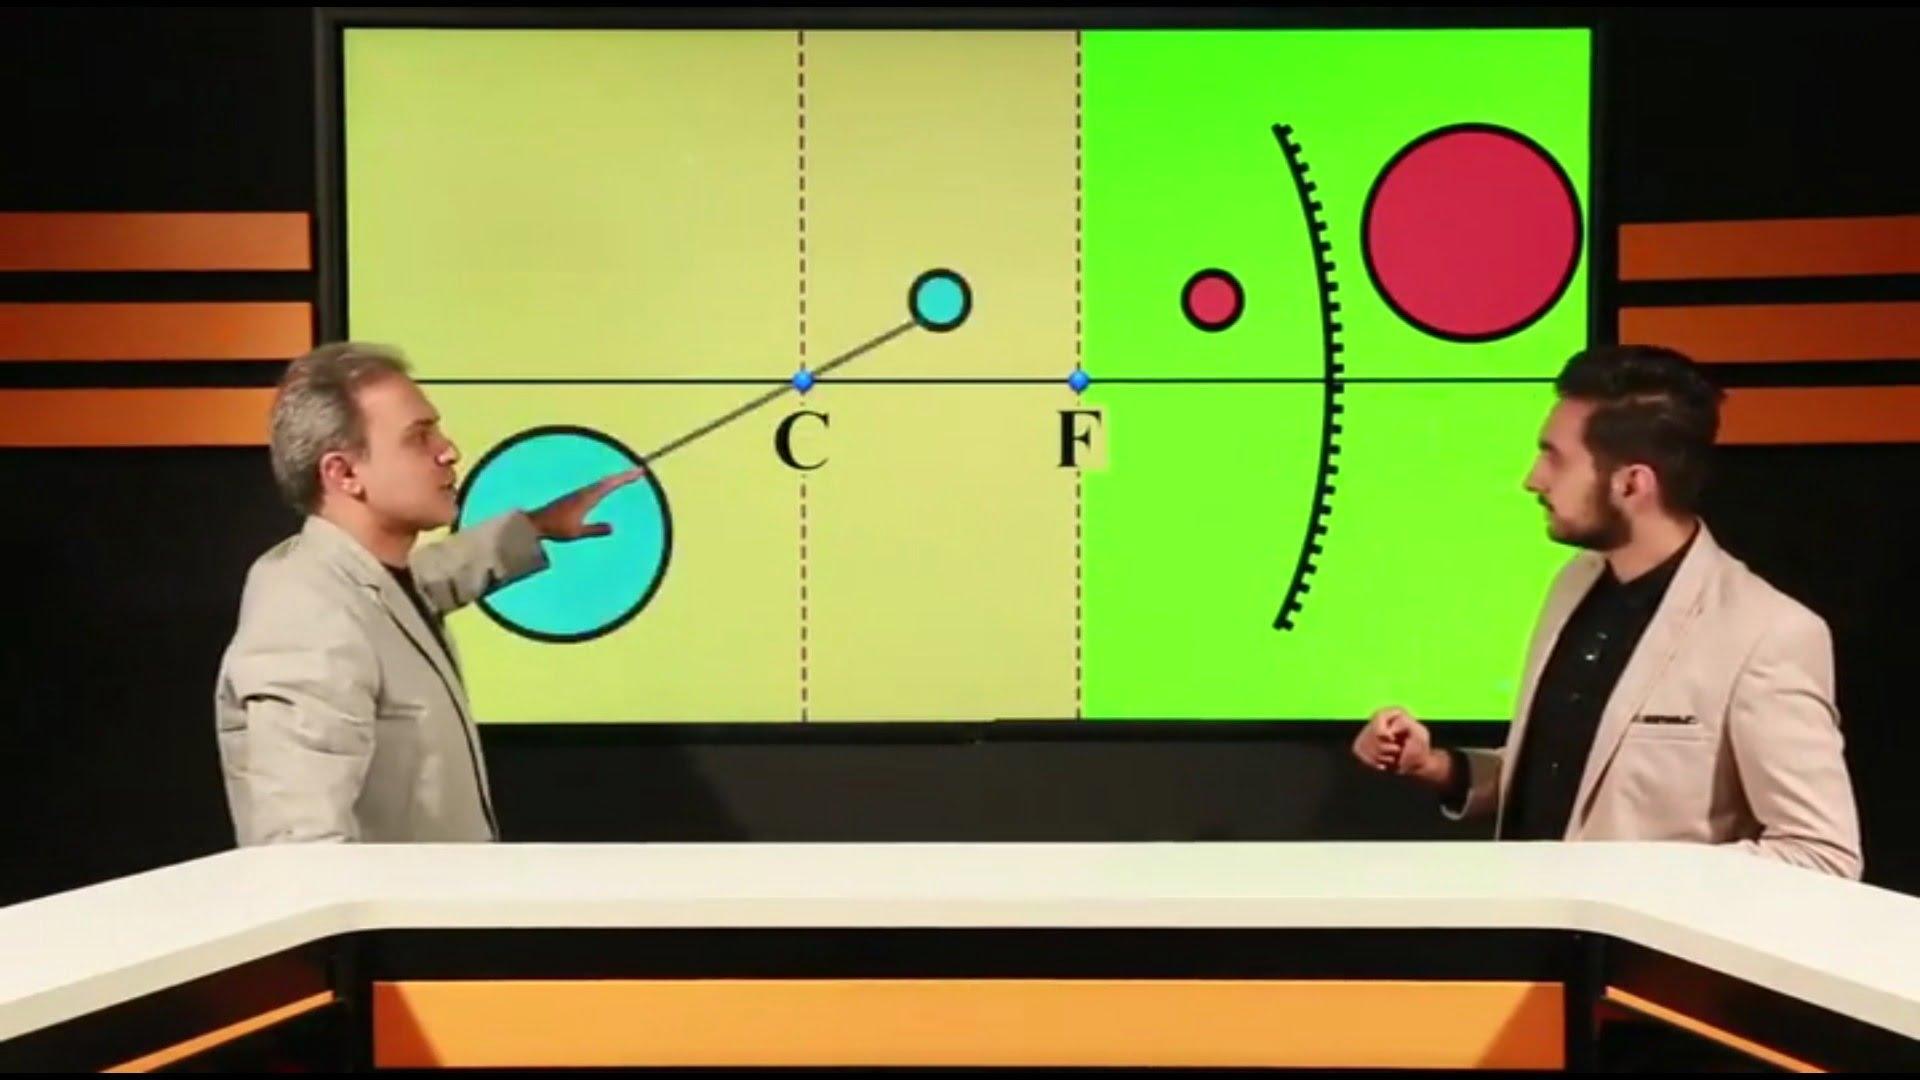 تدریس مبحث آینه کاو فیزیک کنکور فقط در ۱ الگو در دی وی دی فیزیک حرف آخر